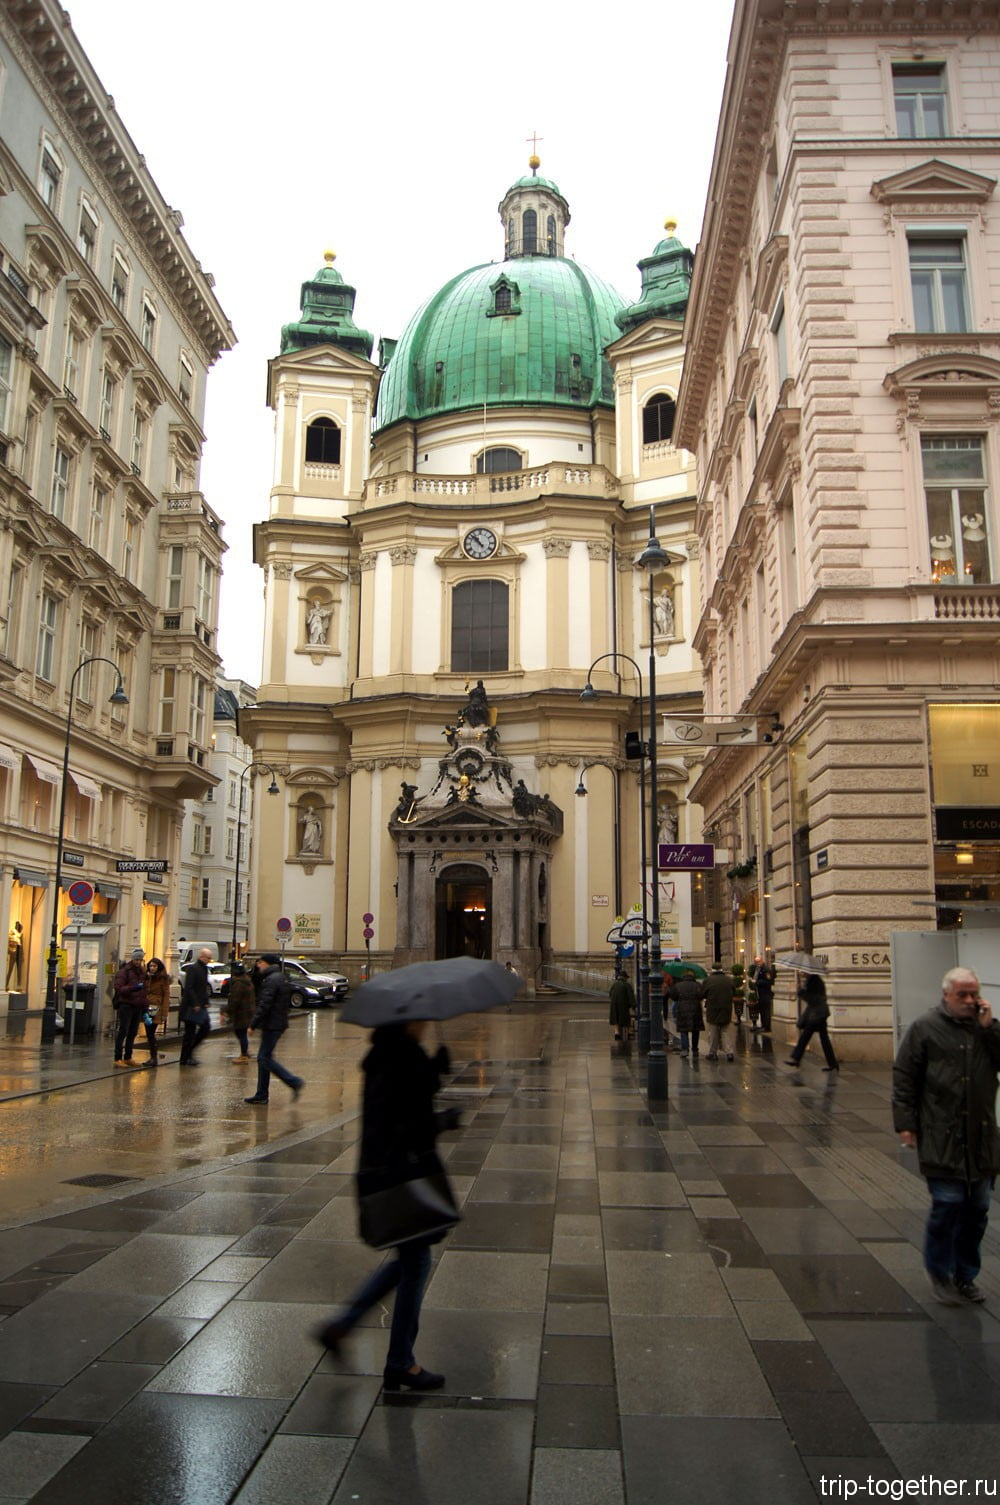 Церковь Святого Петра, Вена